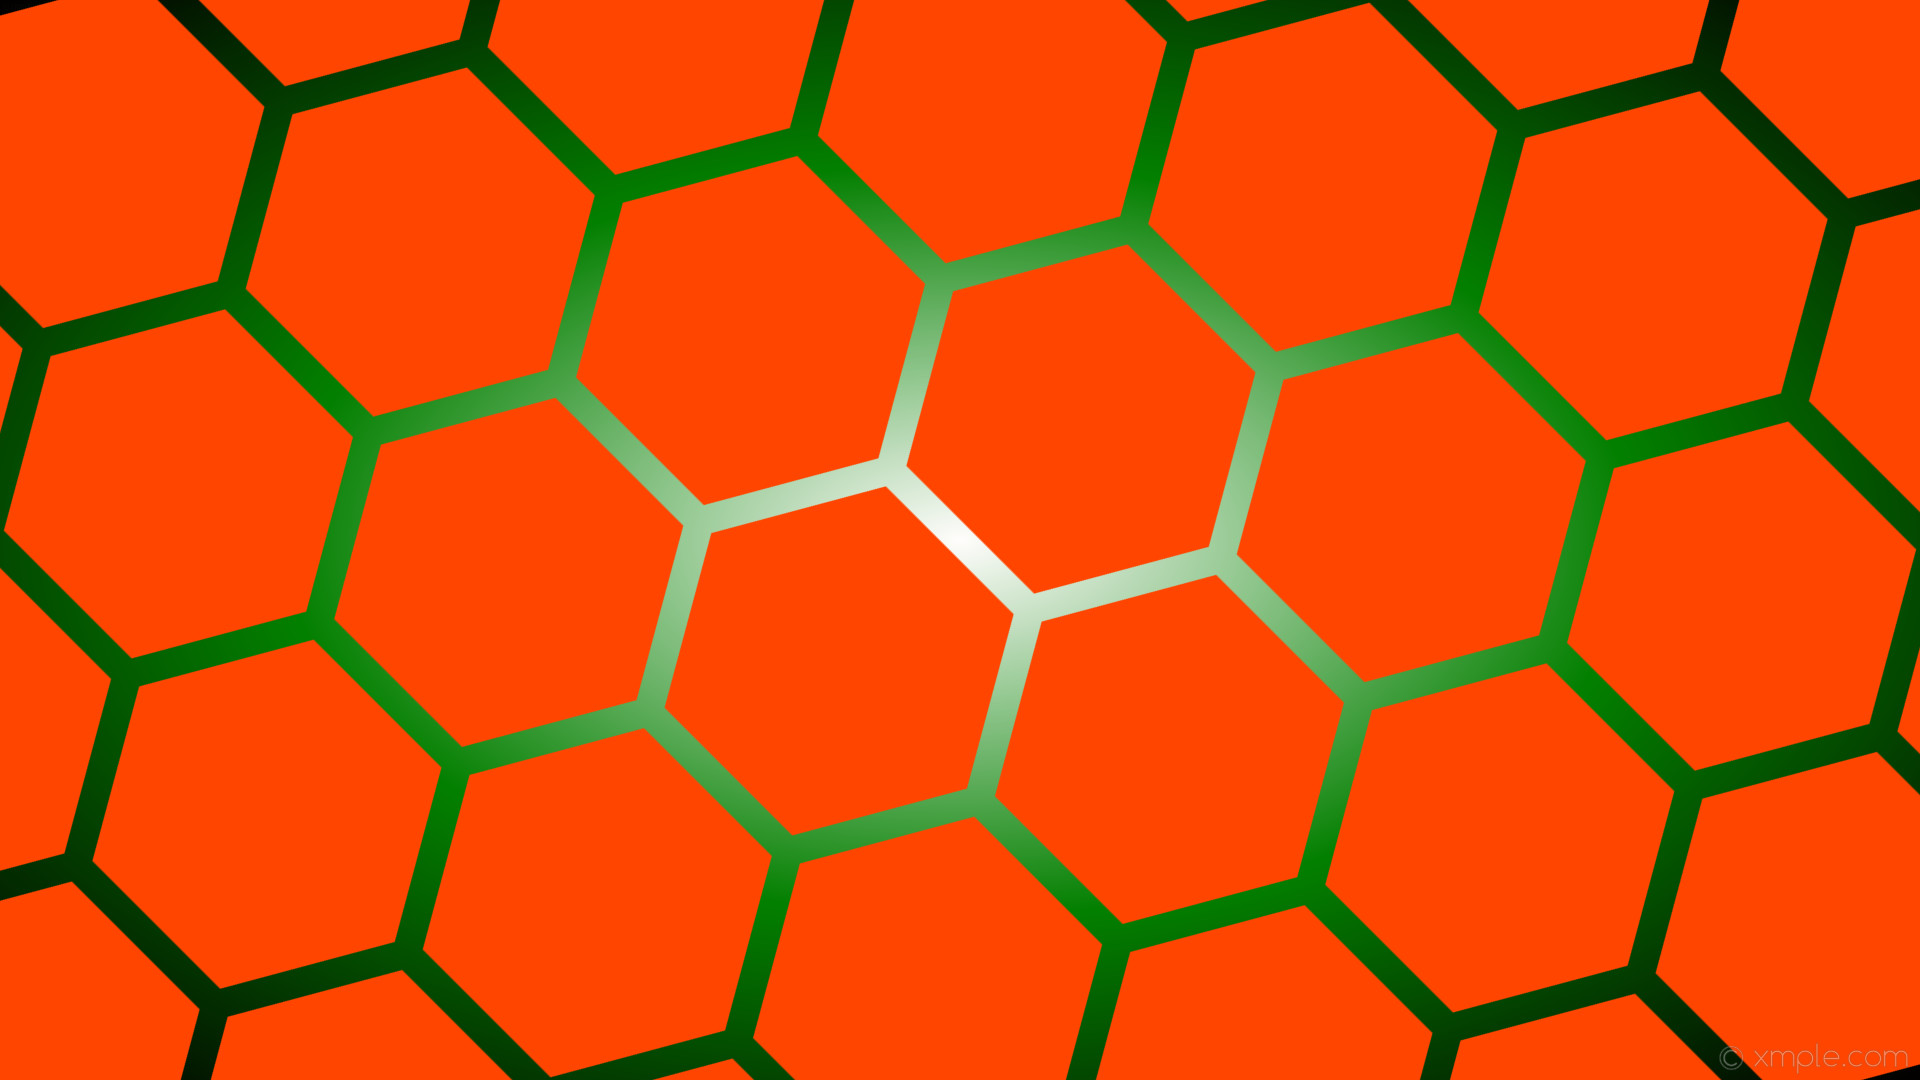 wallpaper hexagon glow gradient green white orange black orangered #ff4500  #ffffff #008000 diagonal